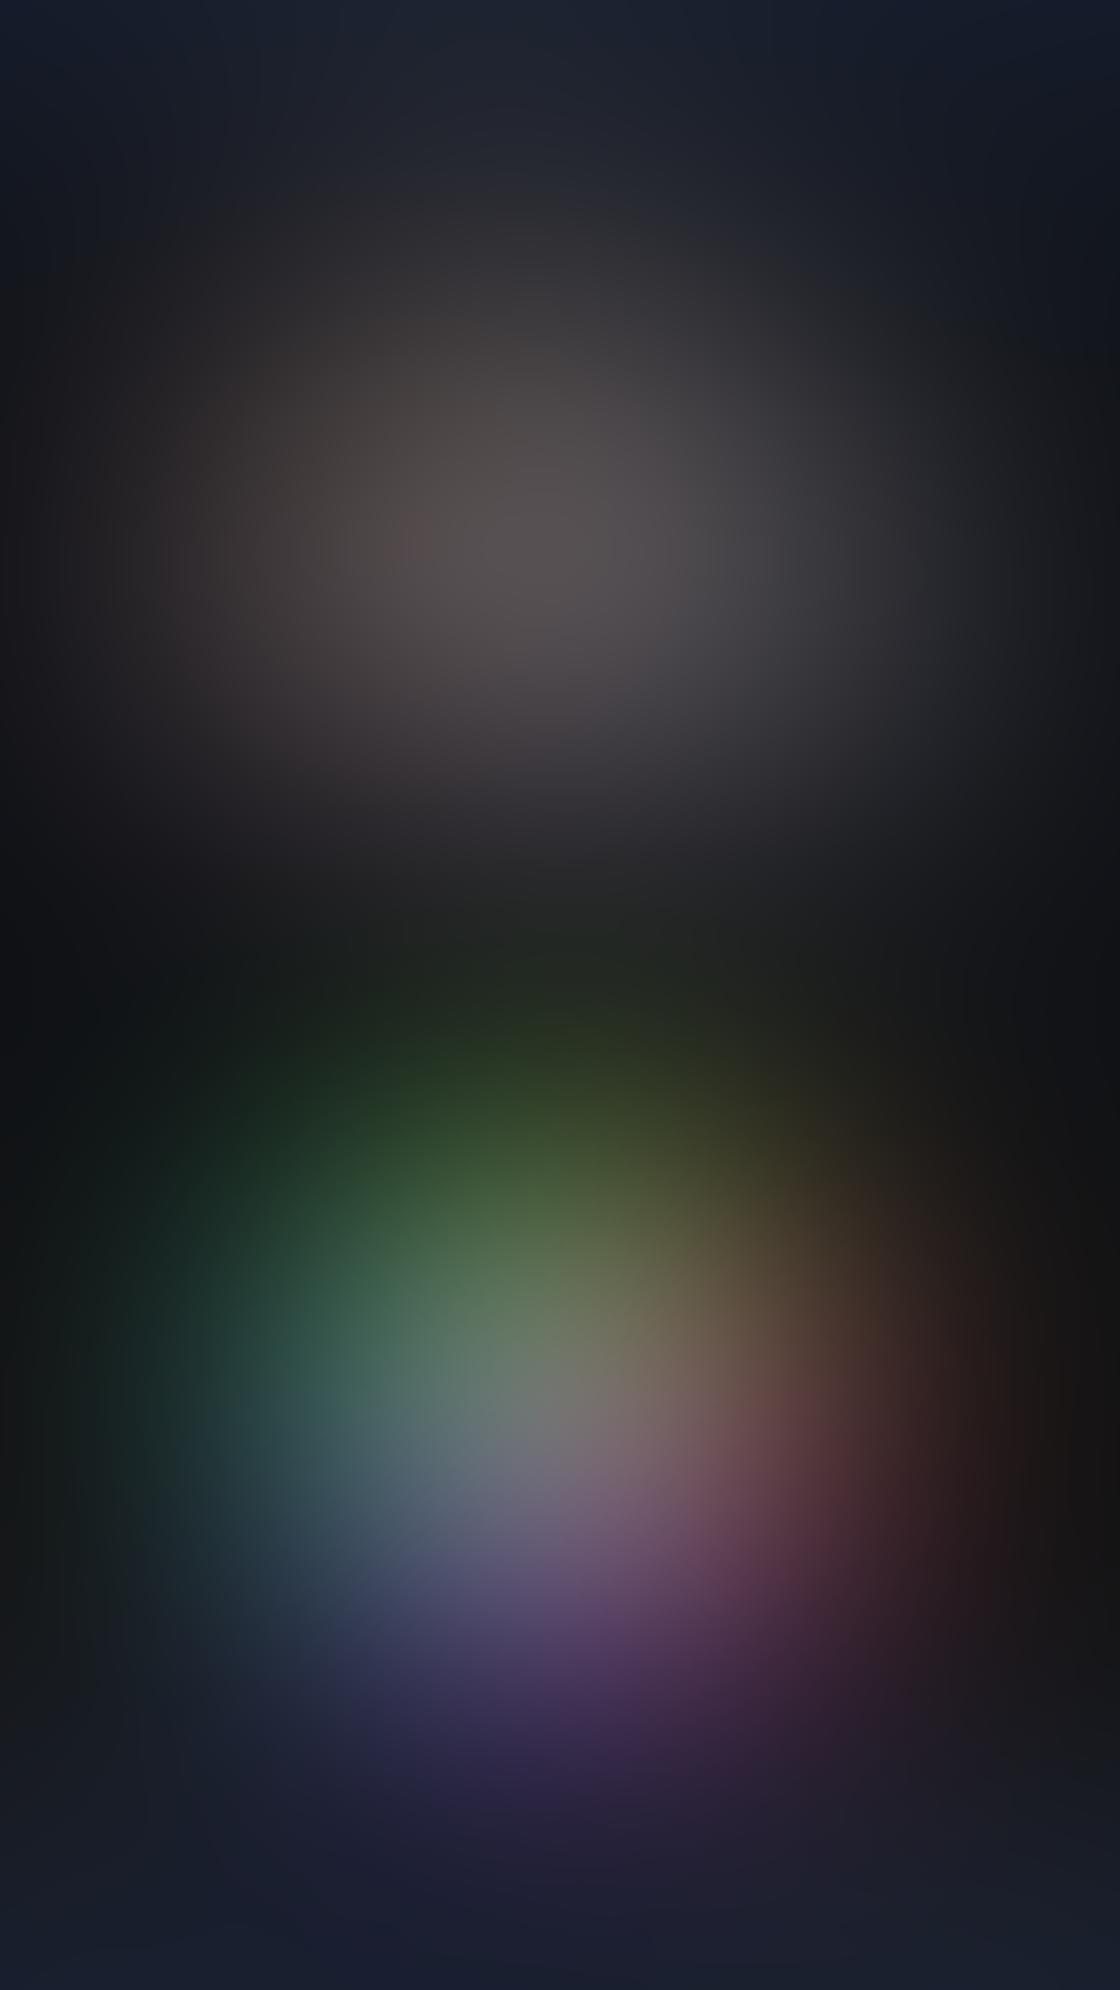 iPhone Photo Editing Workflow 38